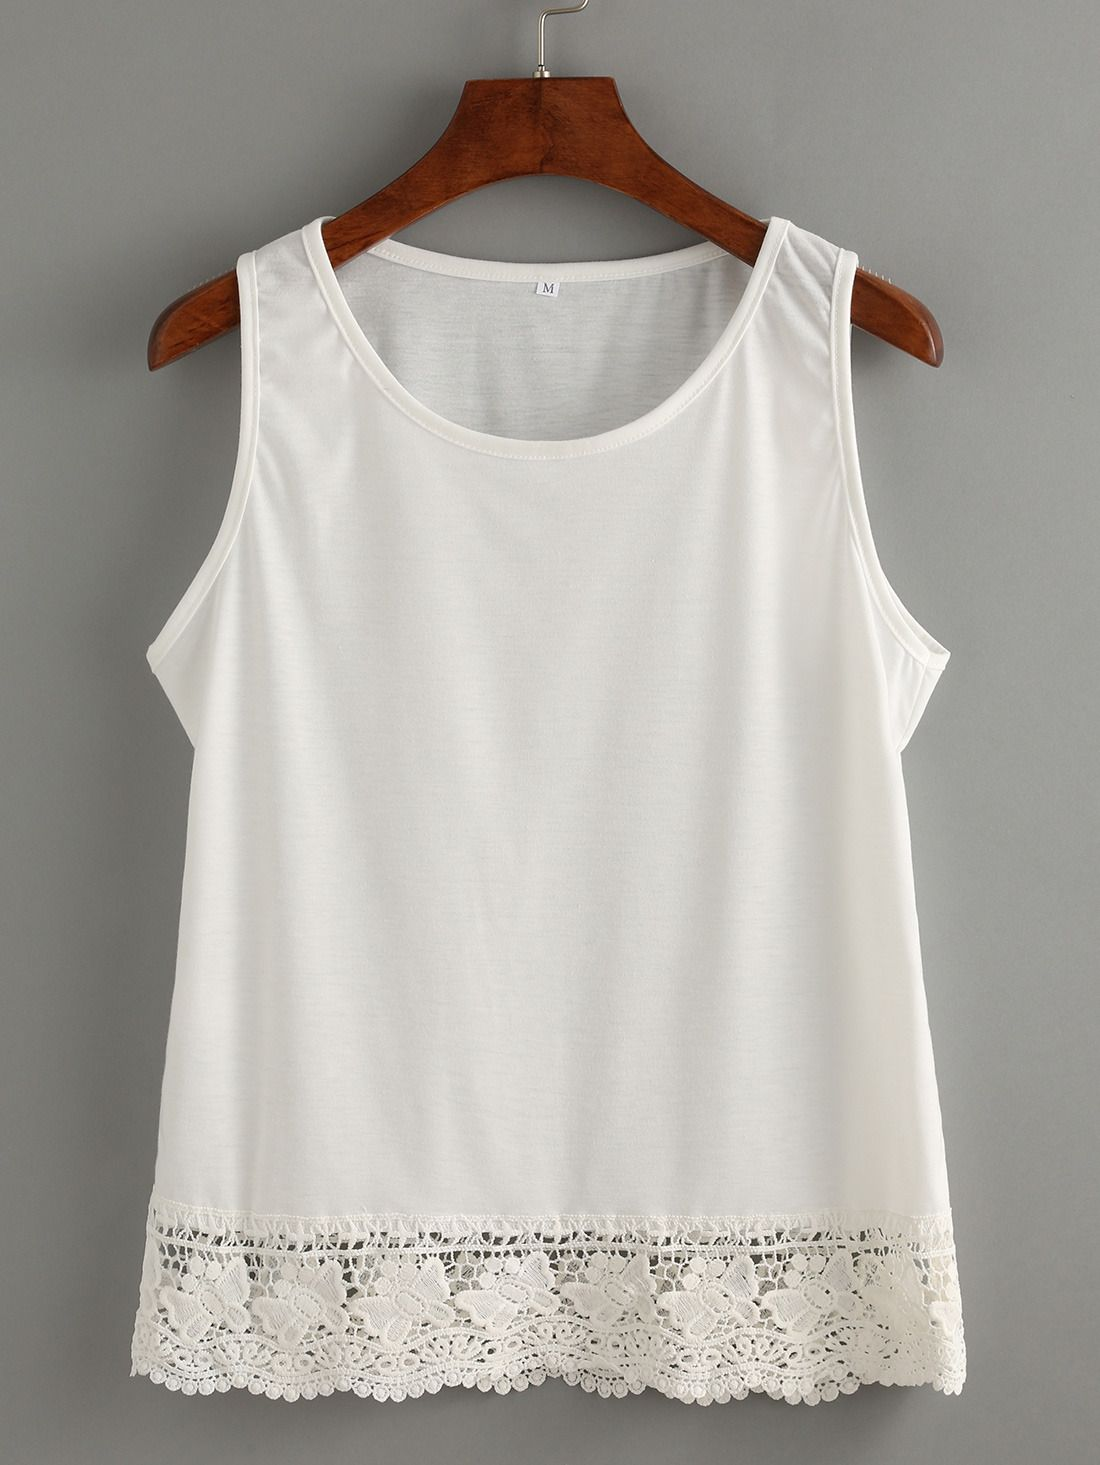 White apron lace trim - Shop White Lace Trim Tank Top Online Shein Offers White Lace Trim Tank Top